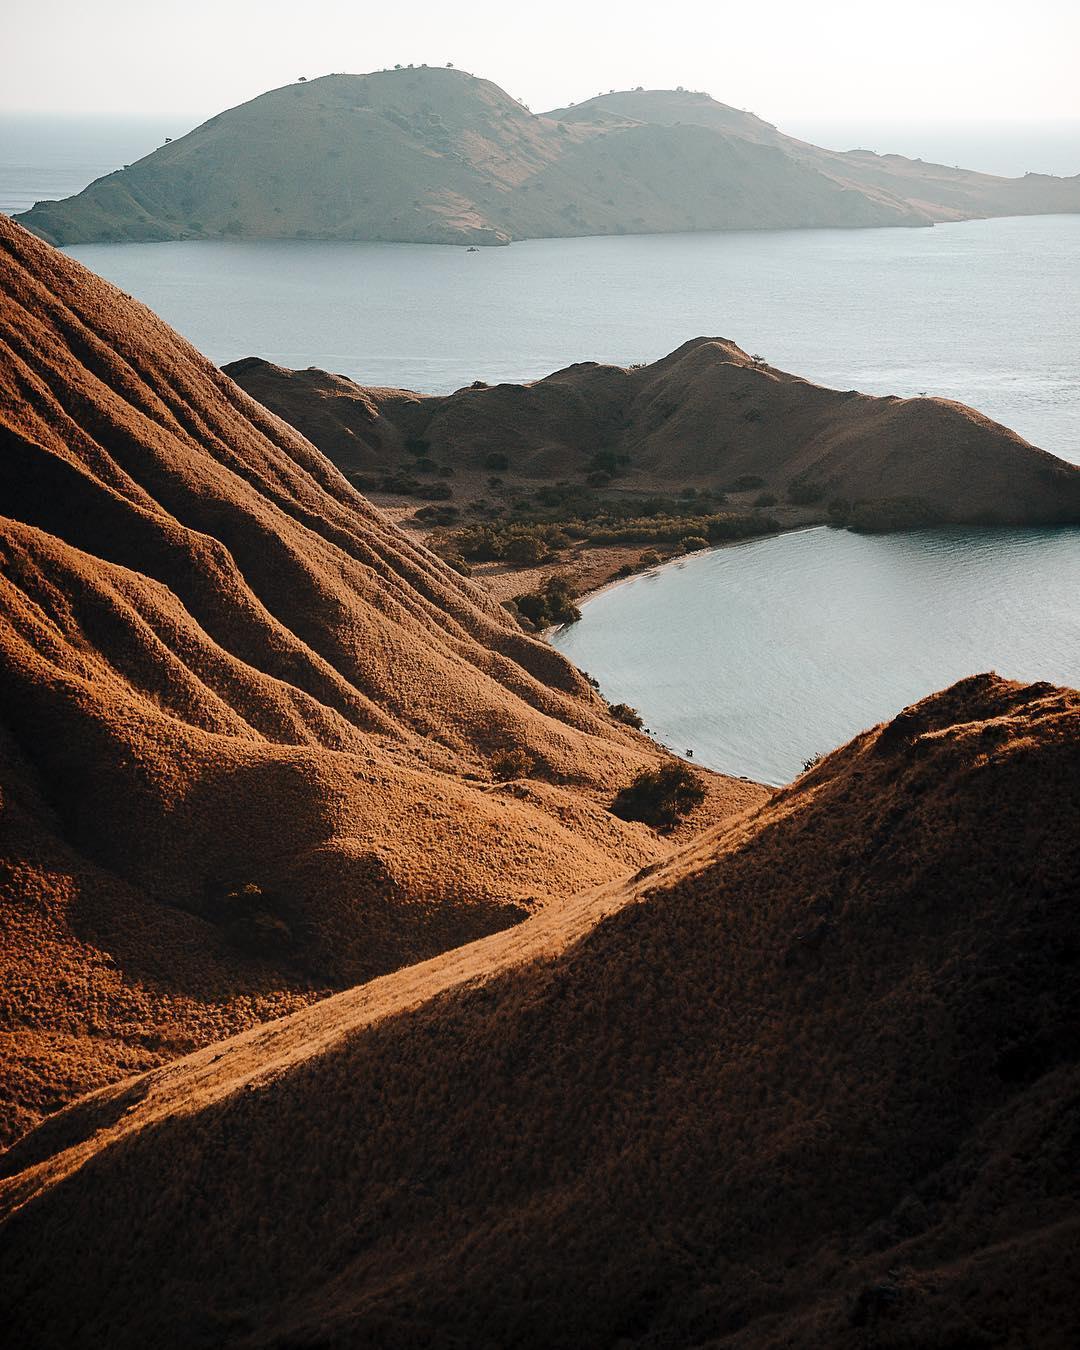 Природа и путешествия на снимках Ллойда Эванса